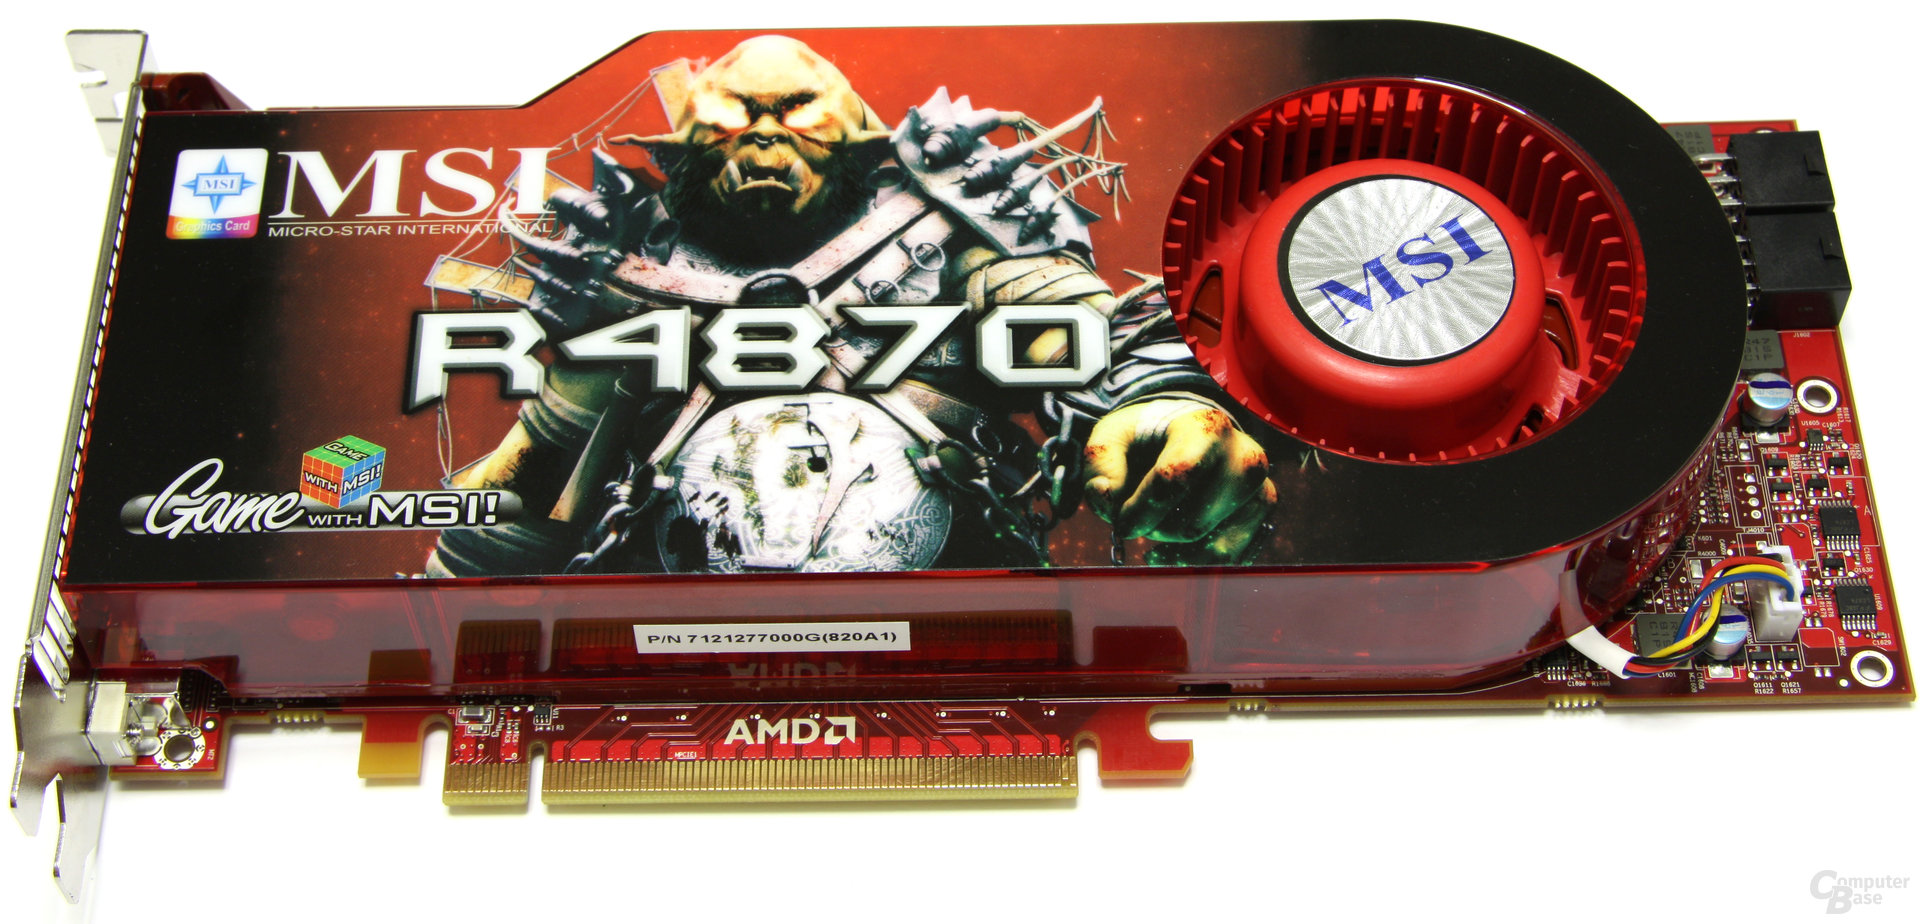 MSI Radeon HD 4870 OC